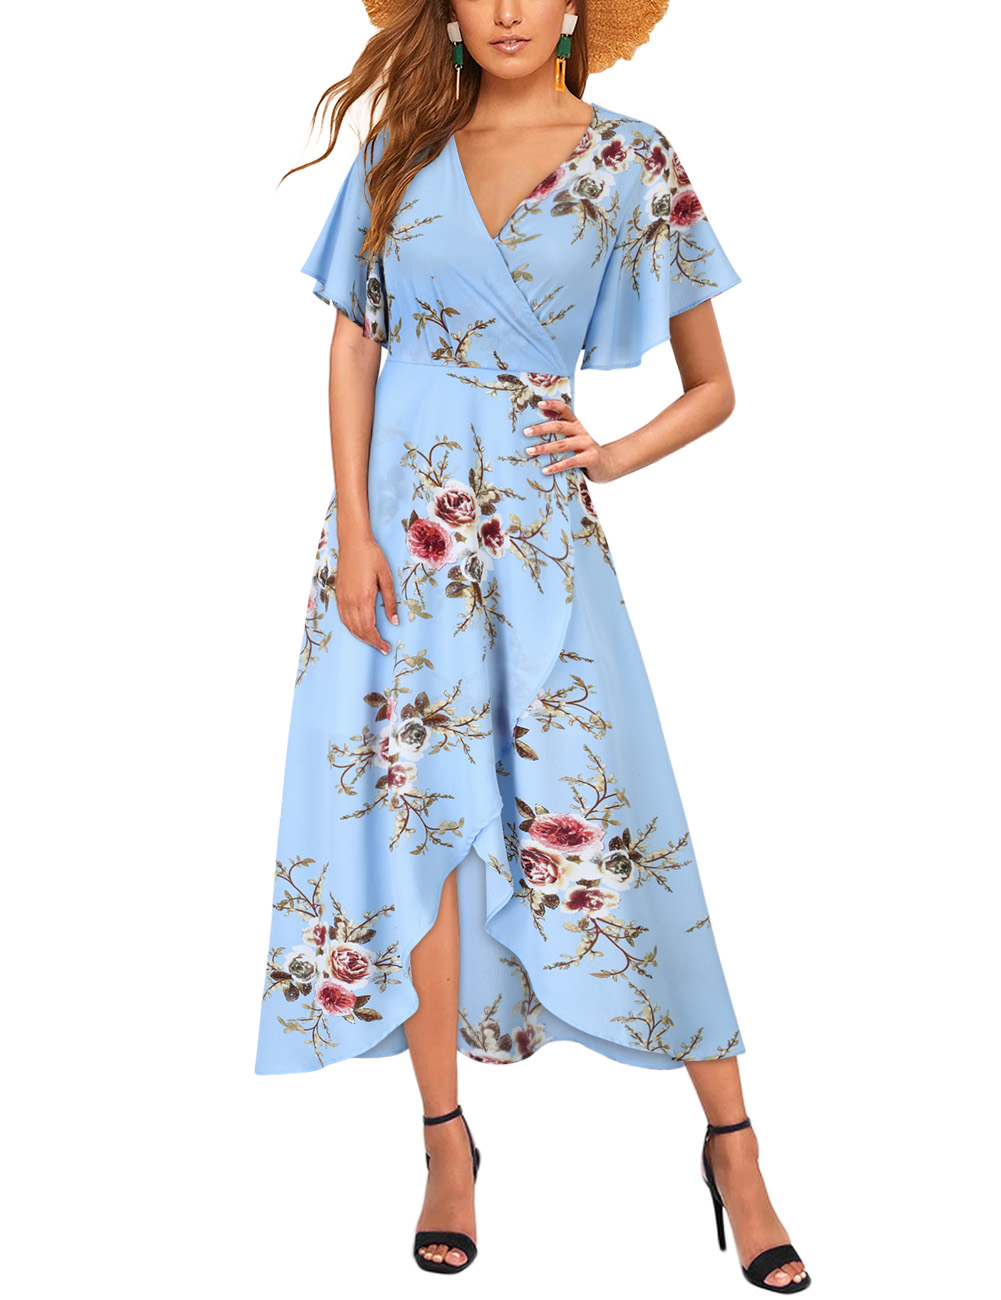 Women Chiffon Dress V-neck Floral Print Short Sleeve Middle Waist Split Maxi Dress